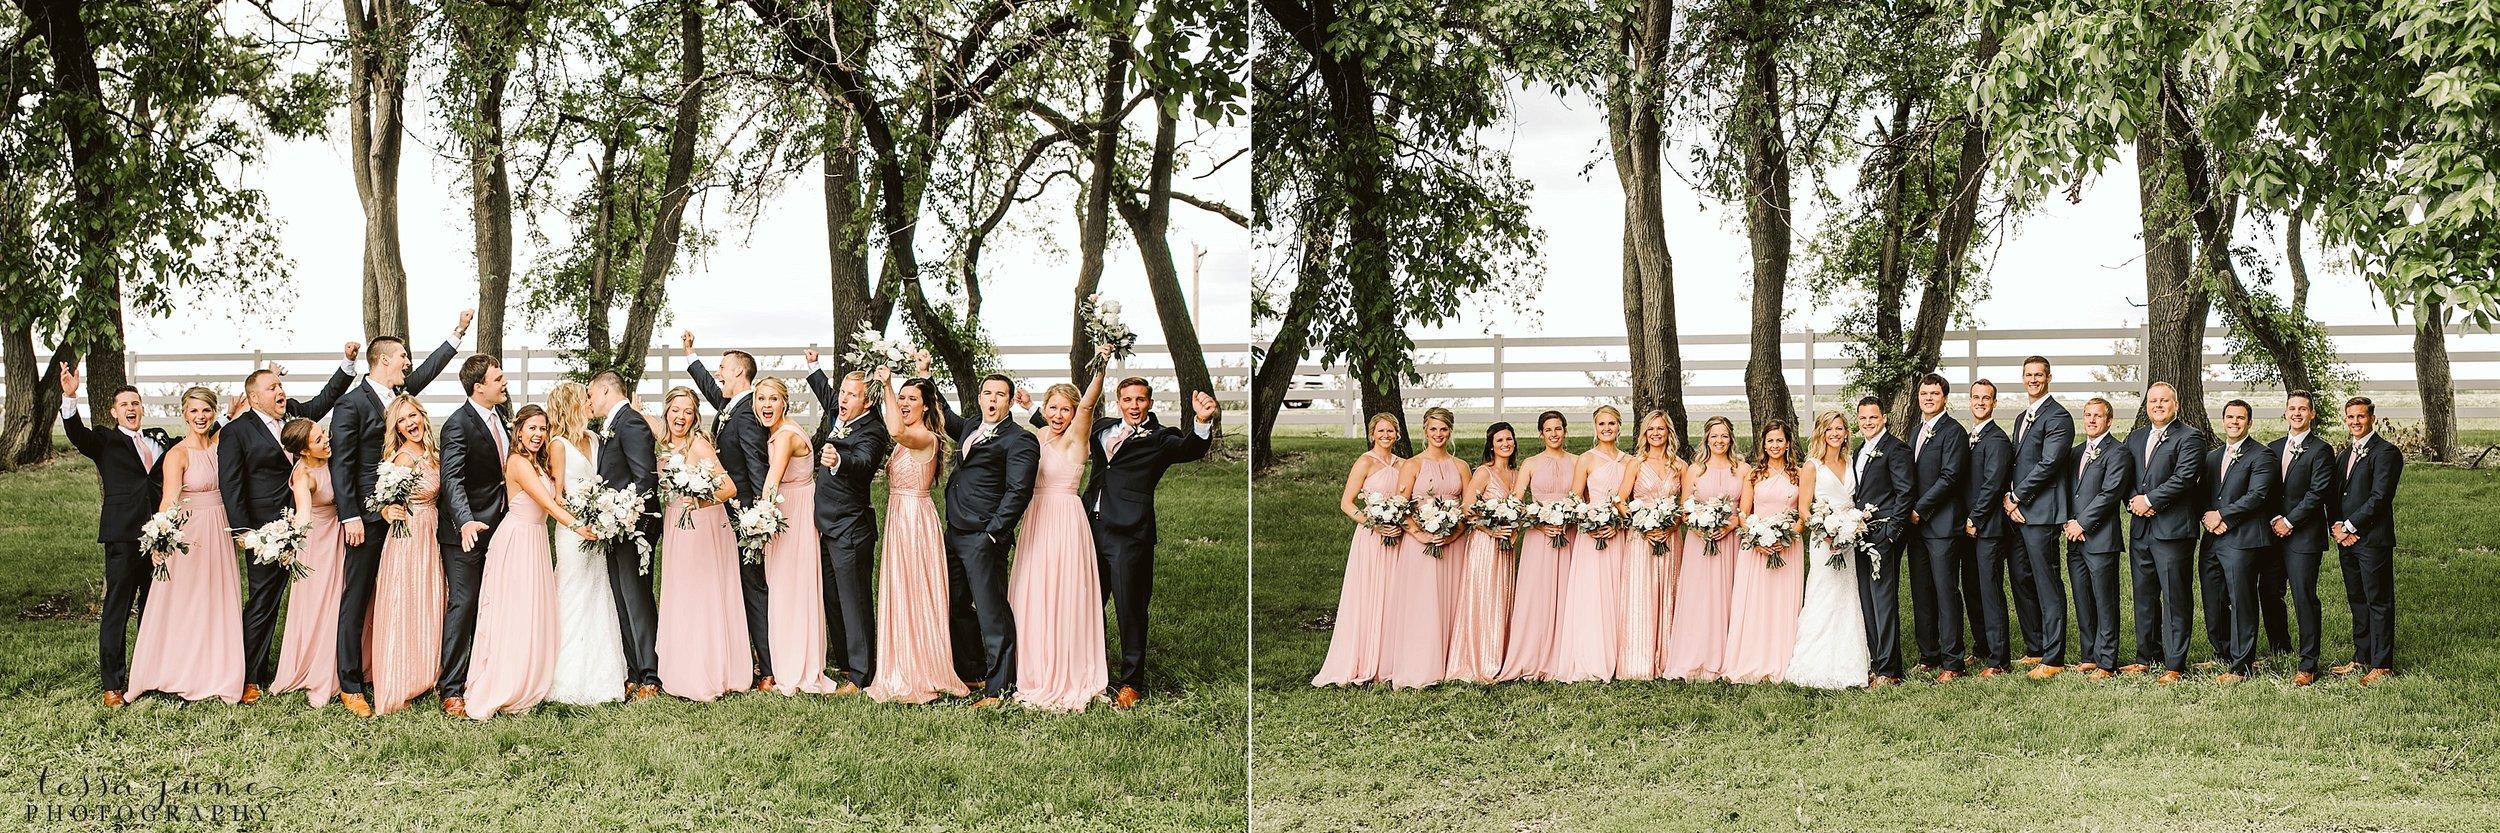 carlos-creek-winery-wedding-summer-pristine-floral-blush-pink-navy-alexandria-minnesota-83.jpg